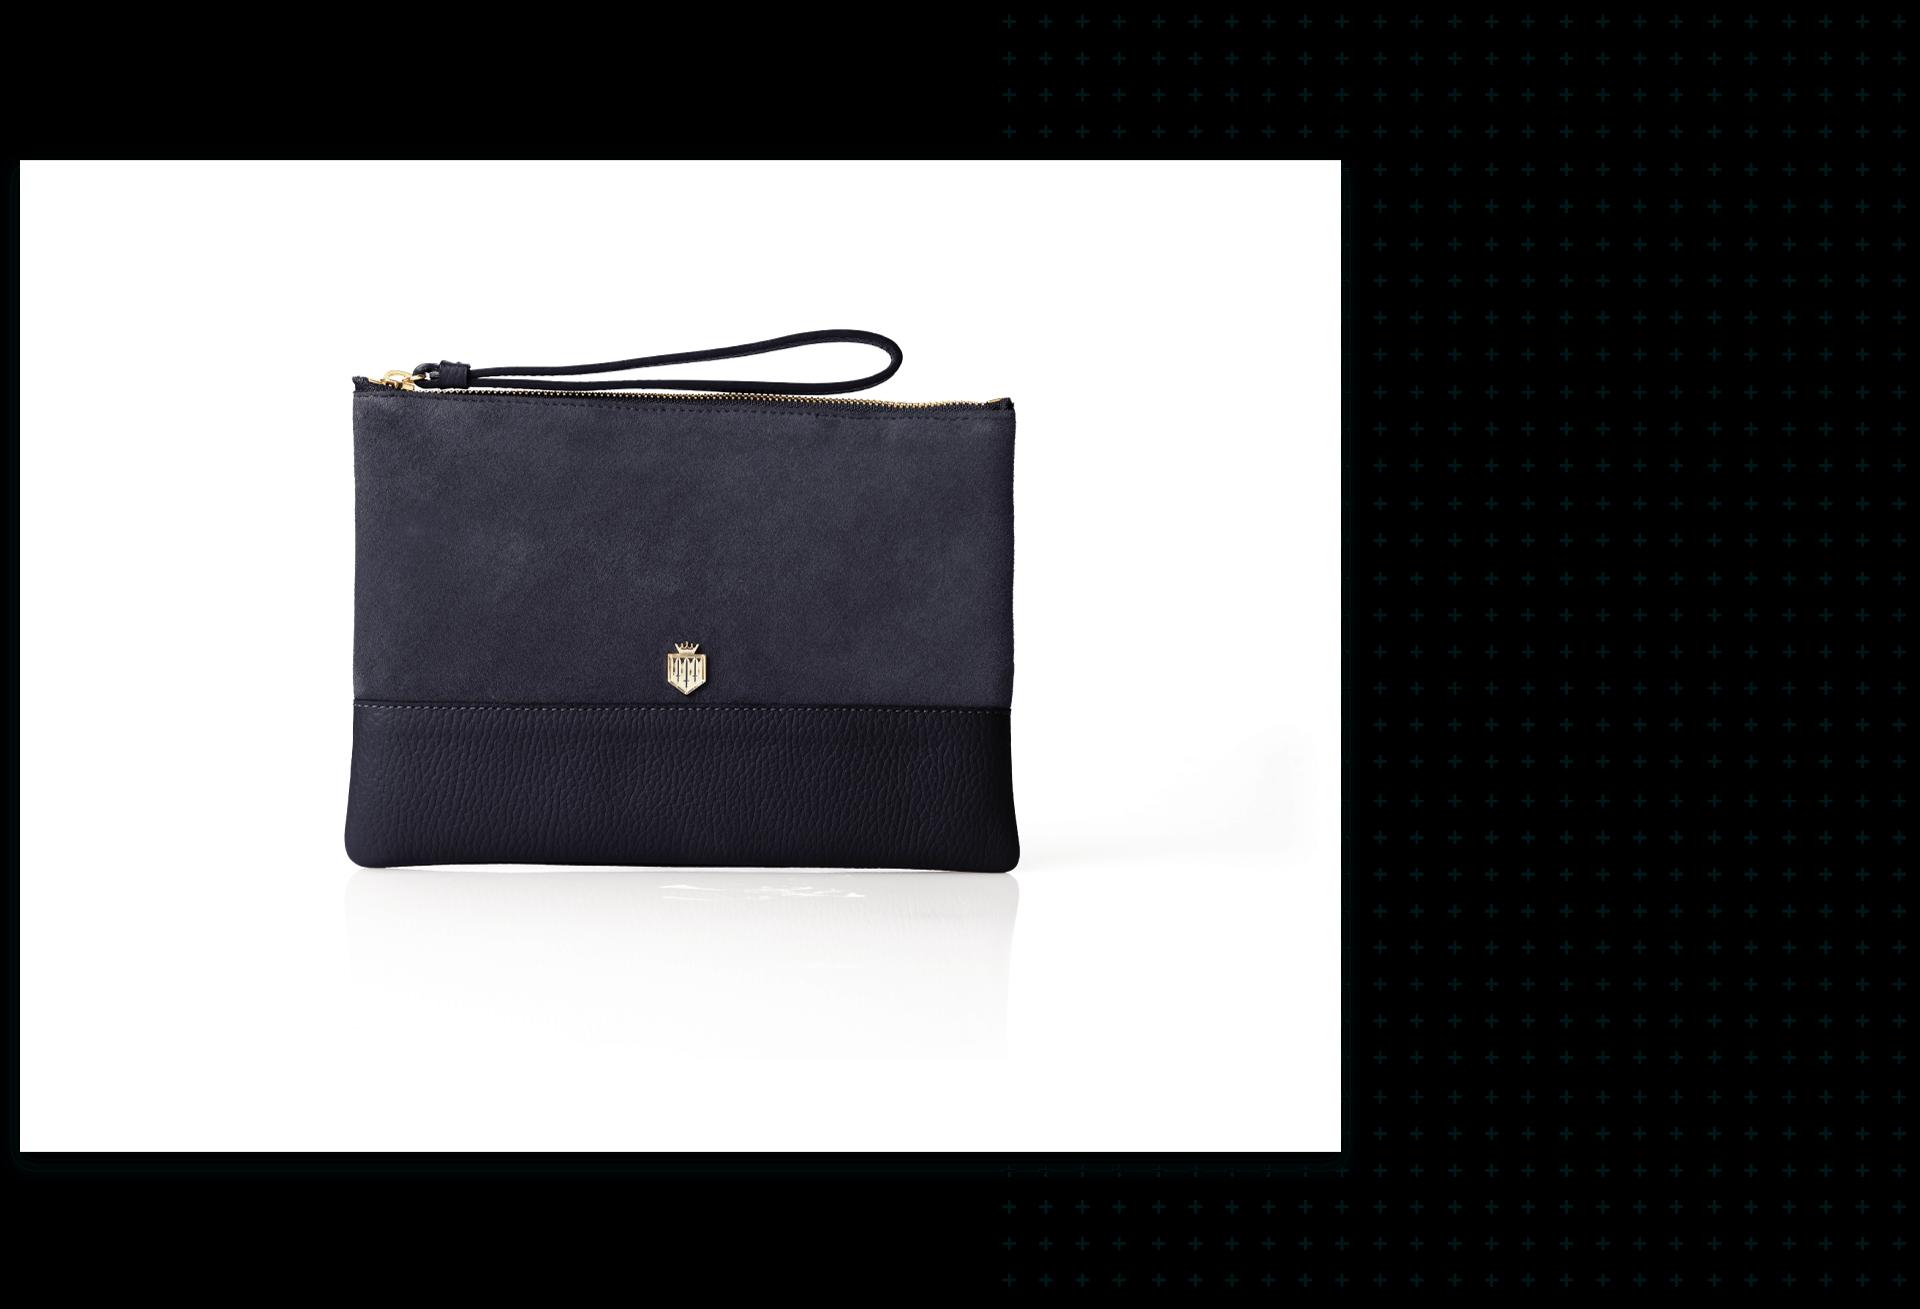 Rectangle shaped black purse